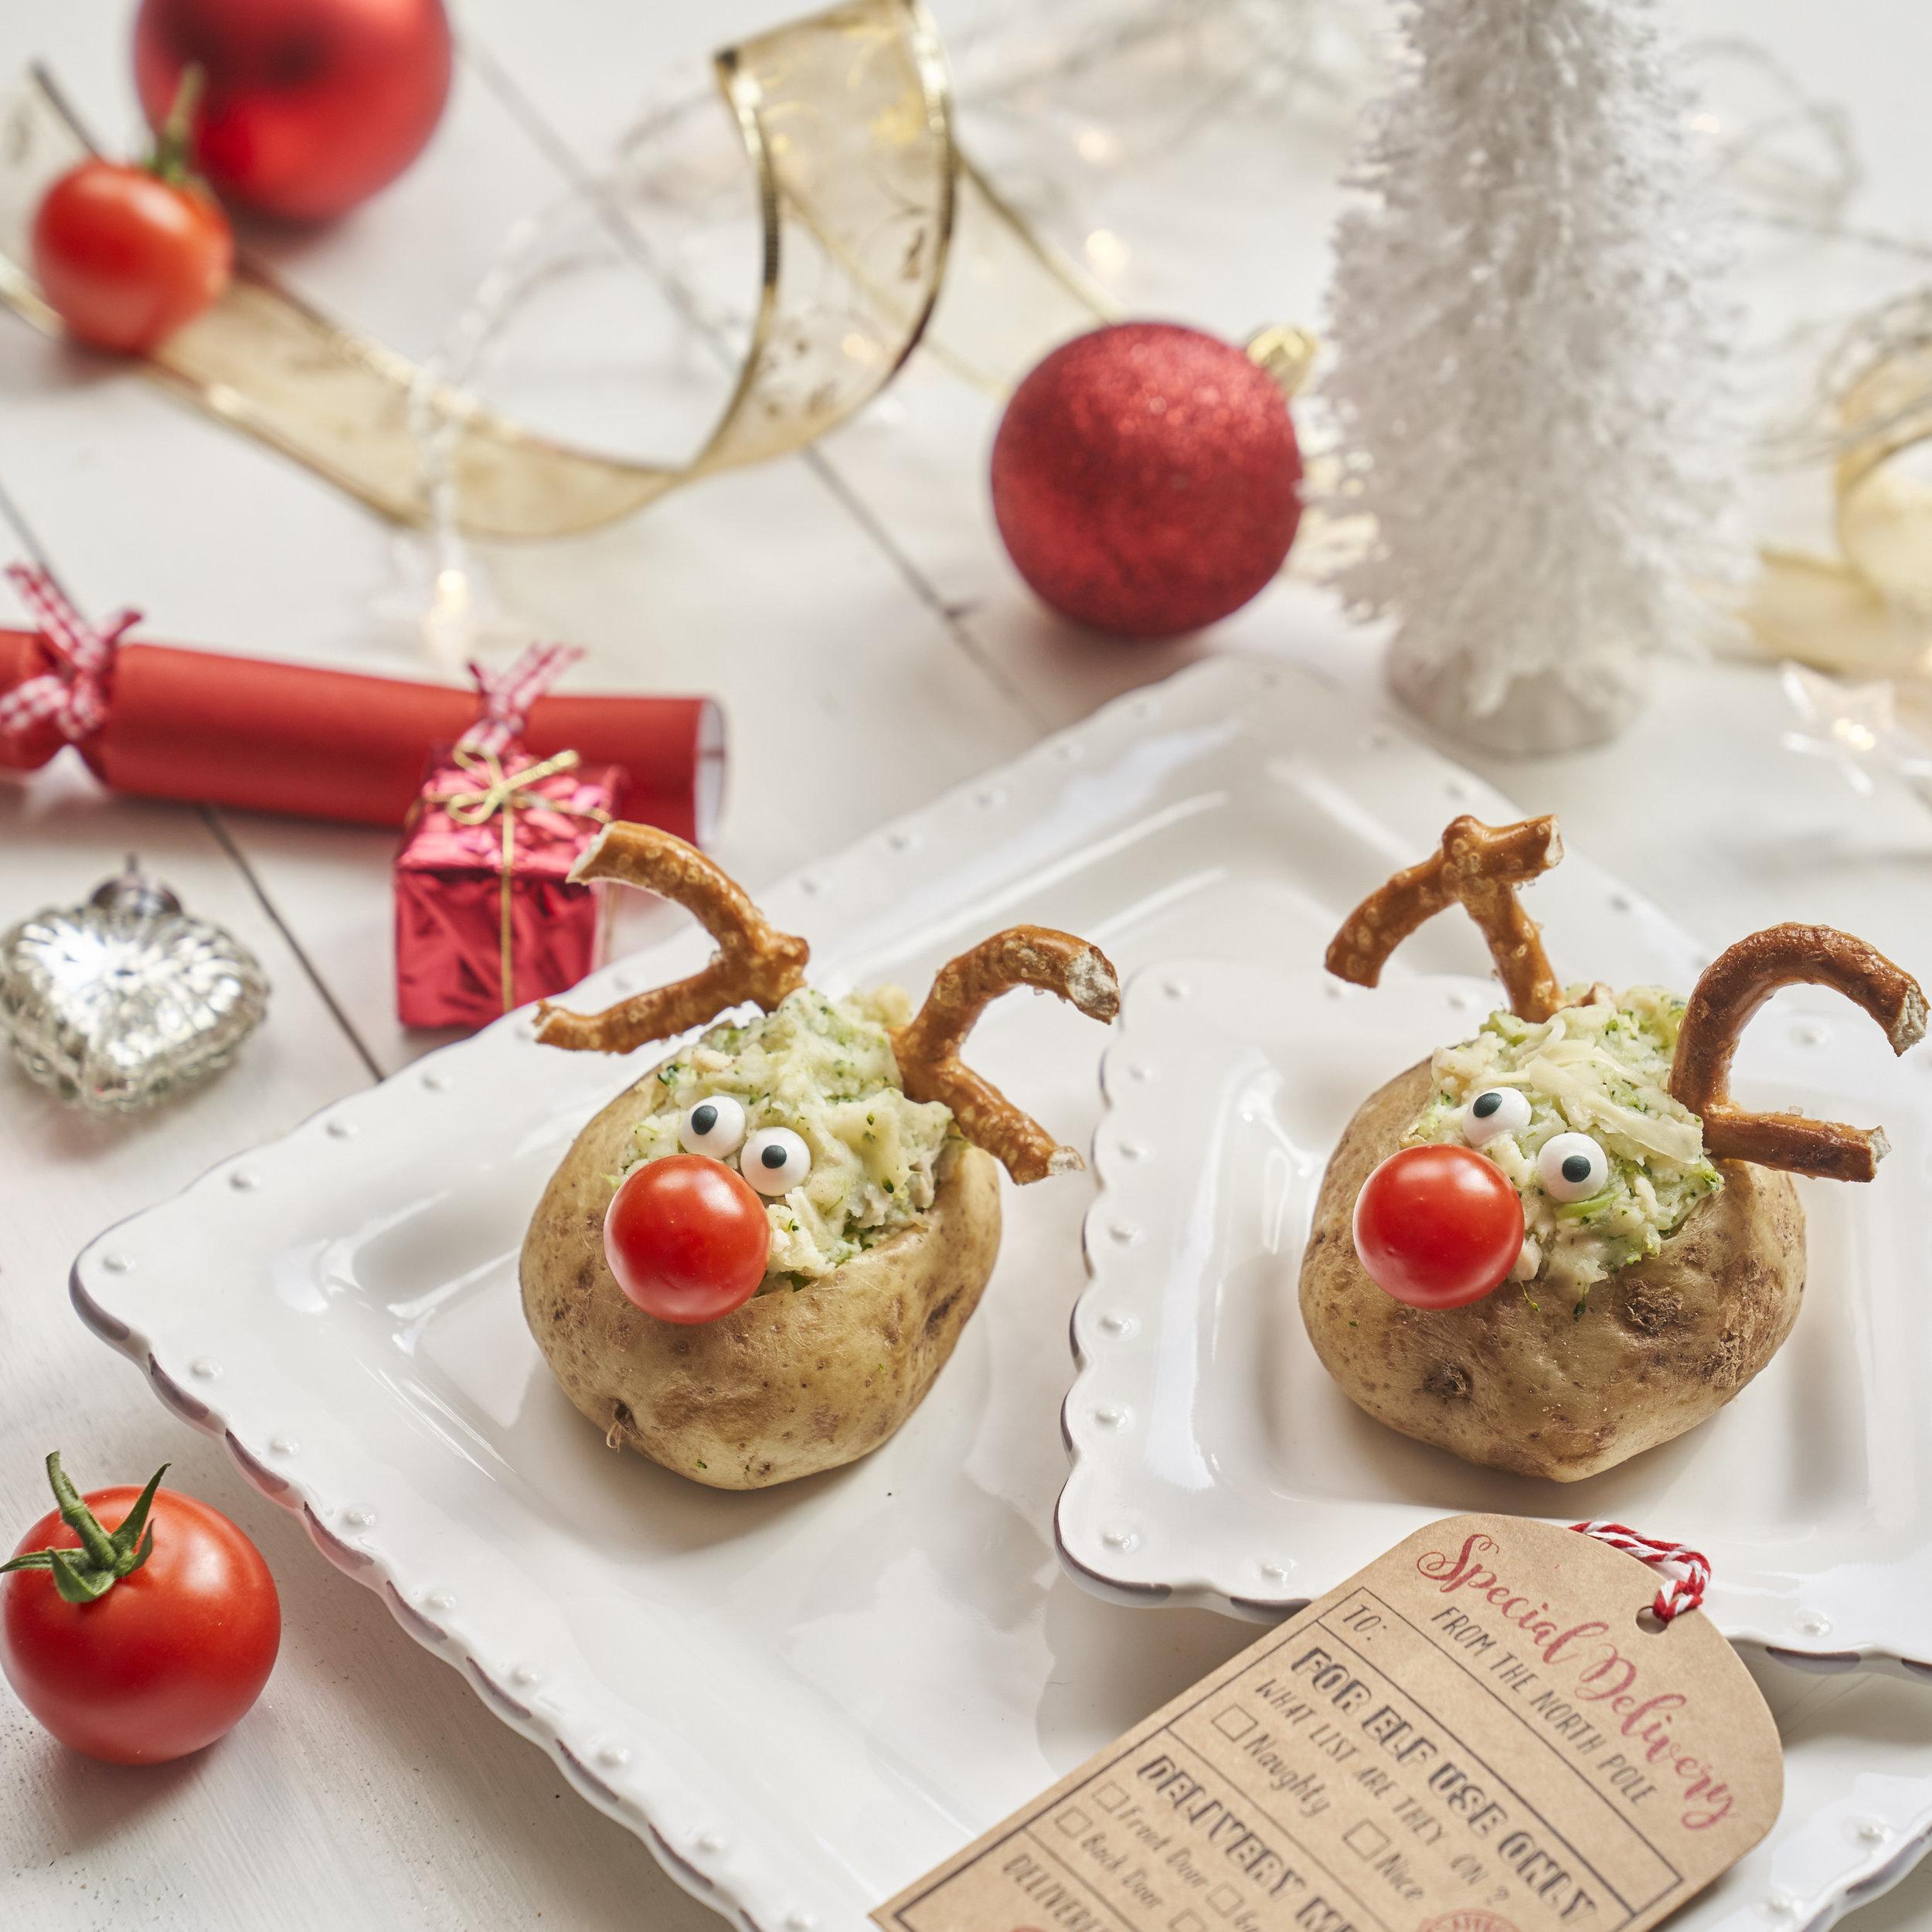 Annabel Karmel's Rudolph Baked Potatoes